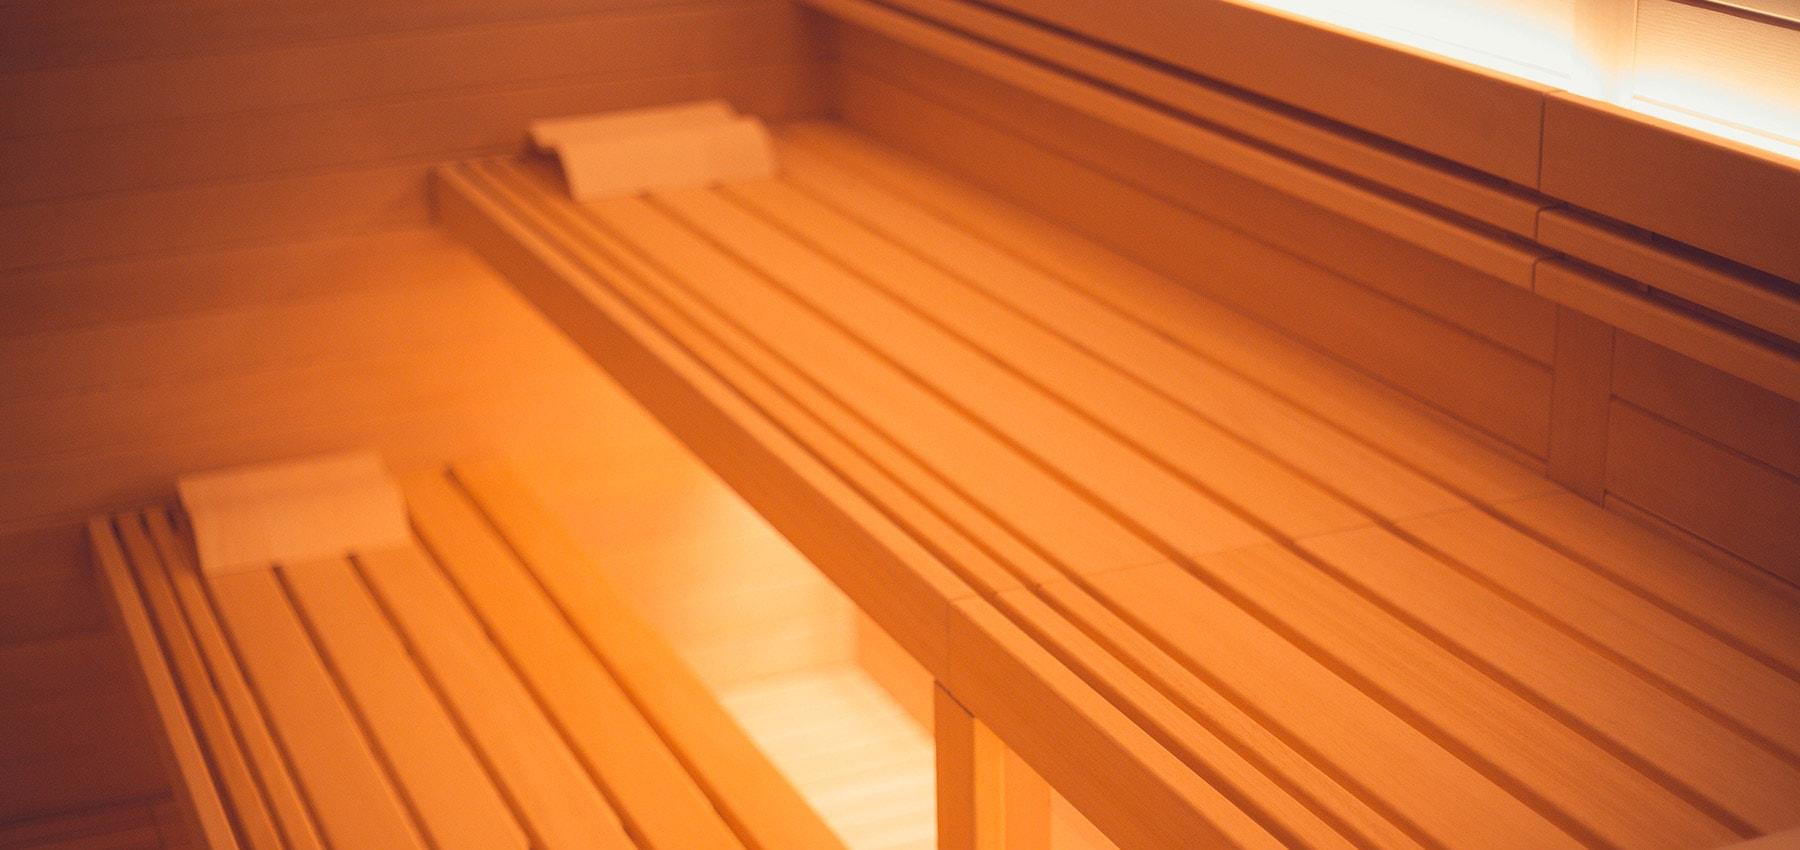 the spa les terrasses d 39 eze hotel. Black Bedroom Furniture Sets. Home Design Ideas